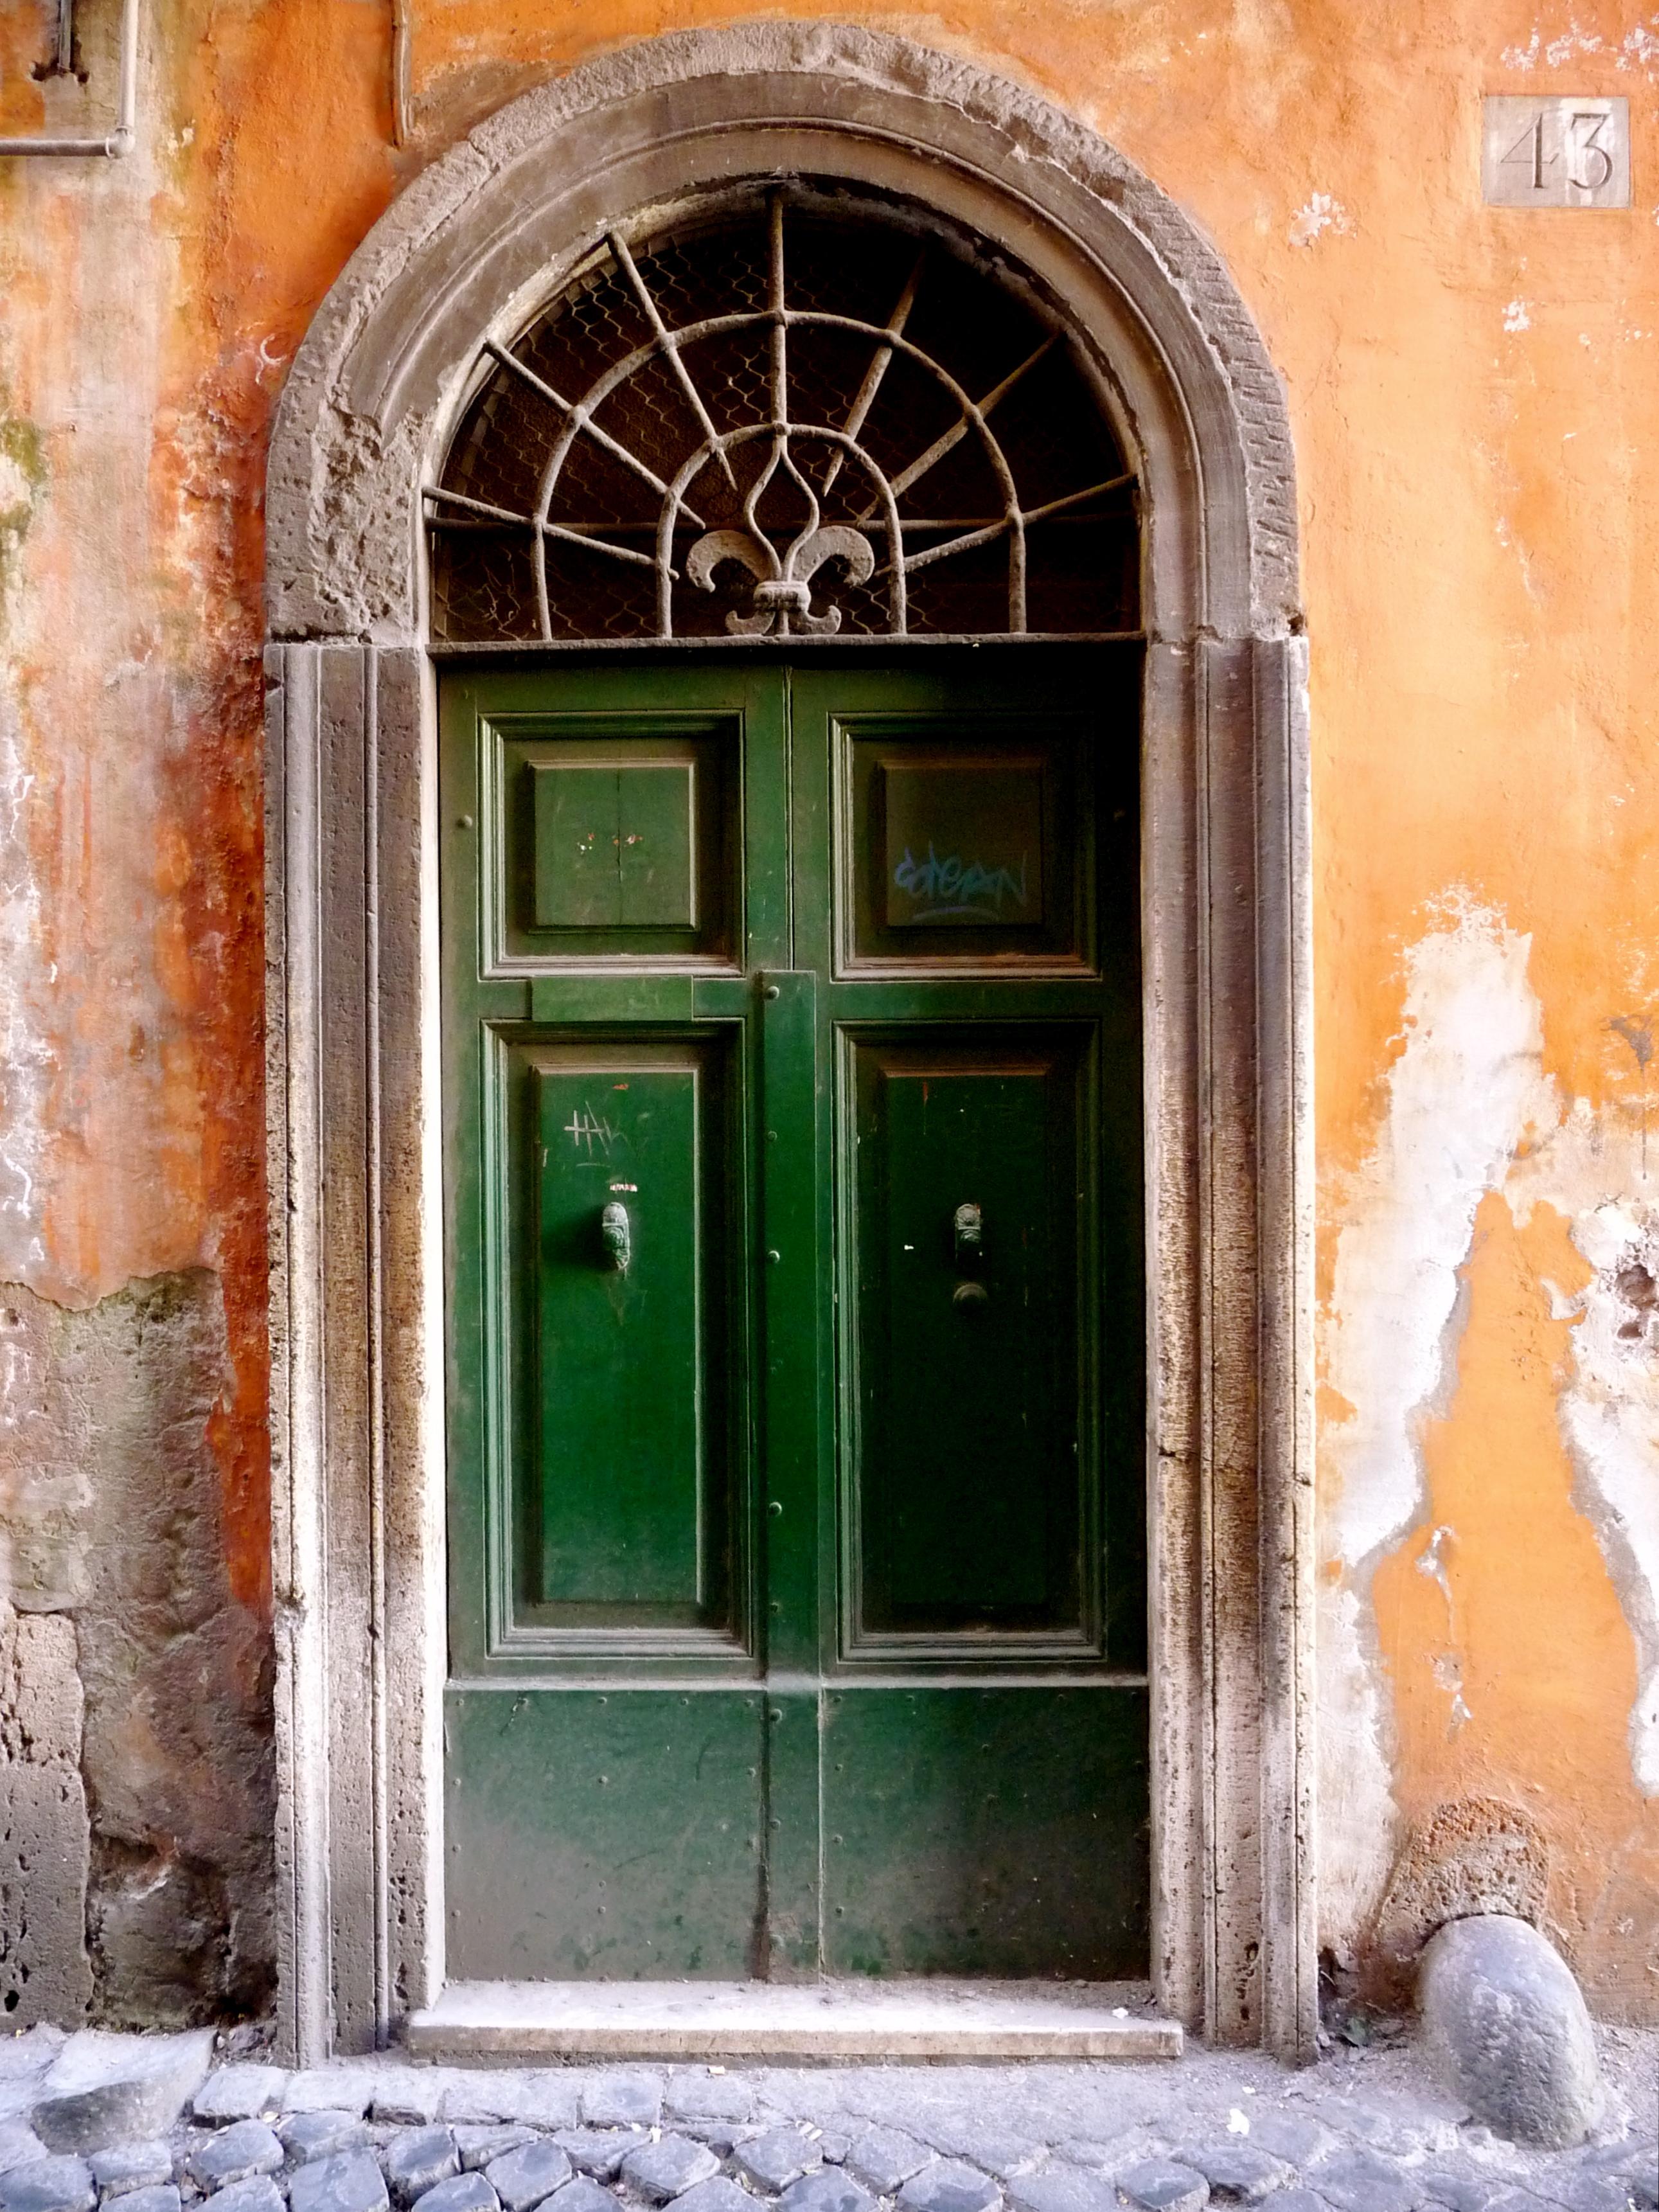 P1020269 & Those Roman Doors - Melange Travel